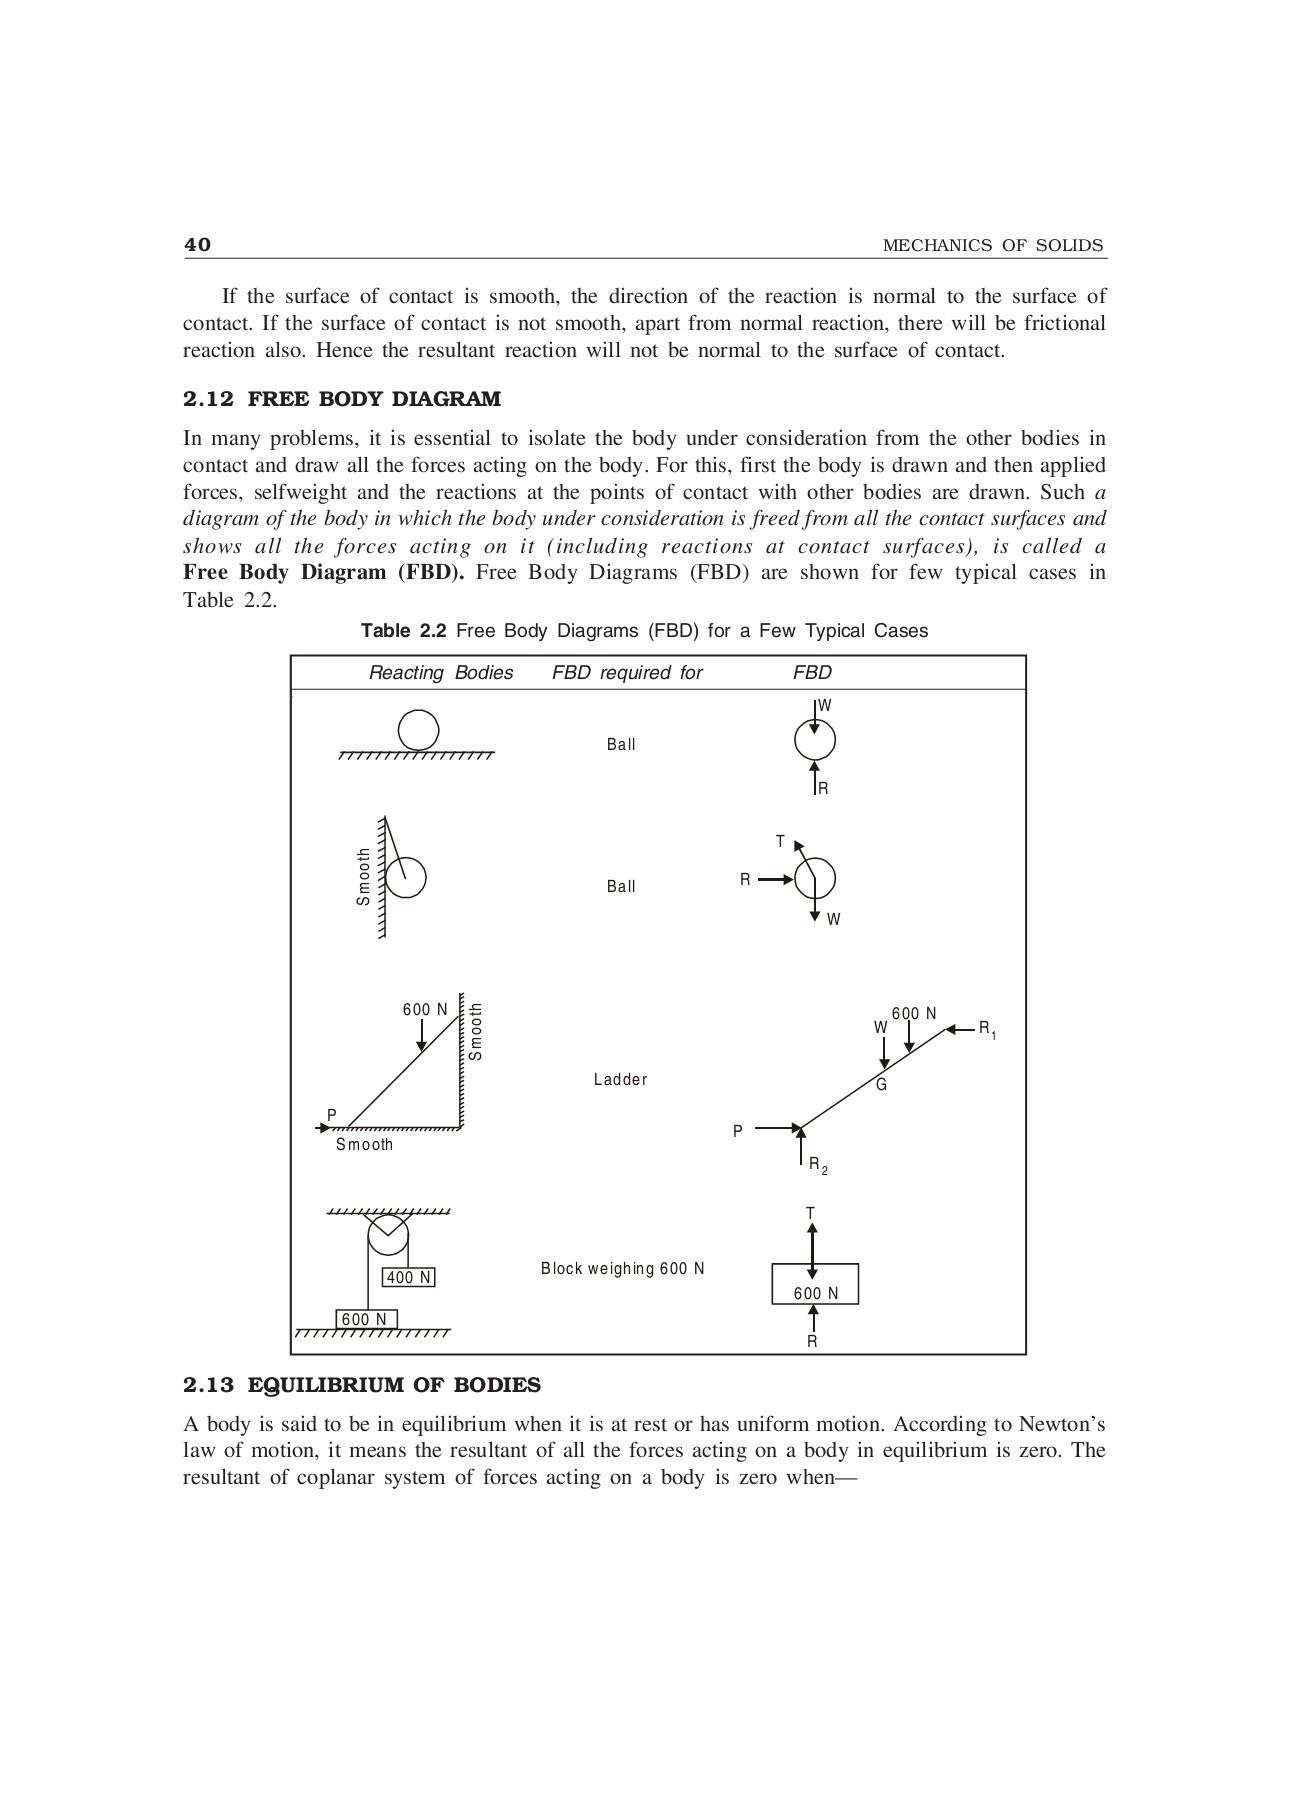 Mechanics Body Diagram Explore Wiring On The Net Free In Engineering My Diagrams